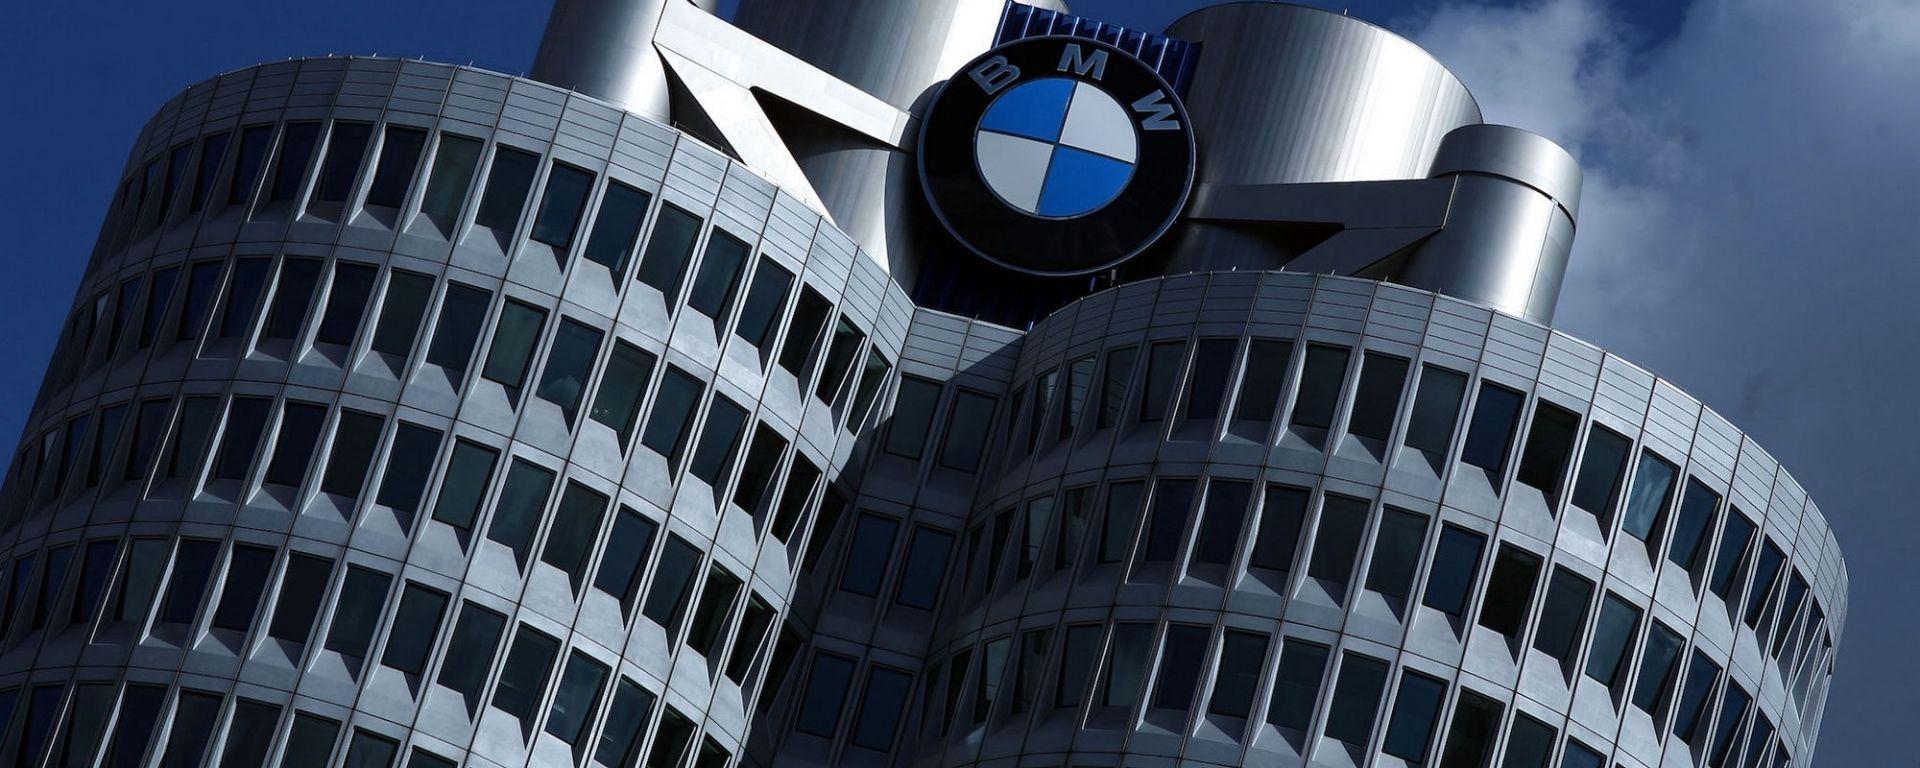 BMW, perquisite due sedi per manipolazione software motori diesel